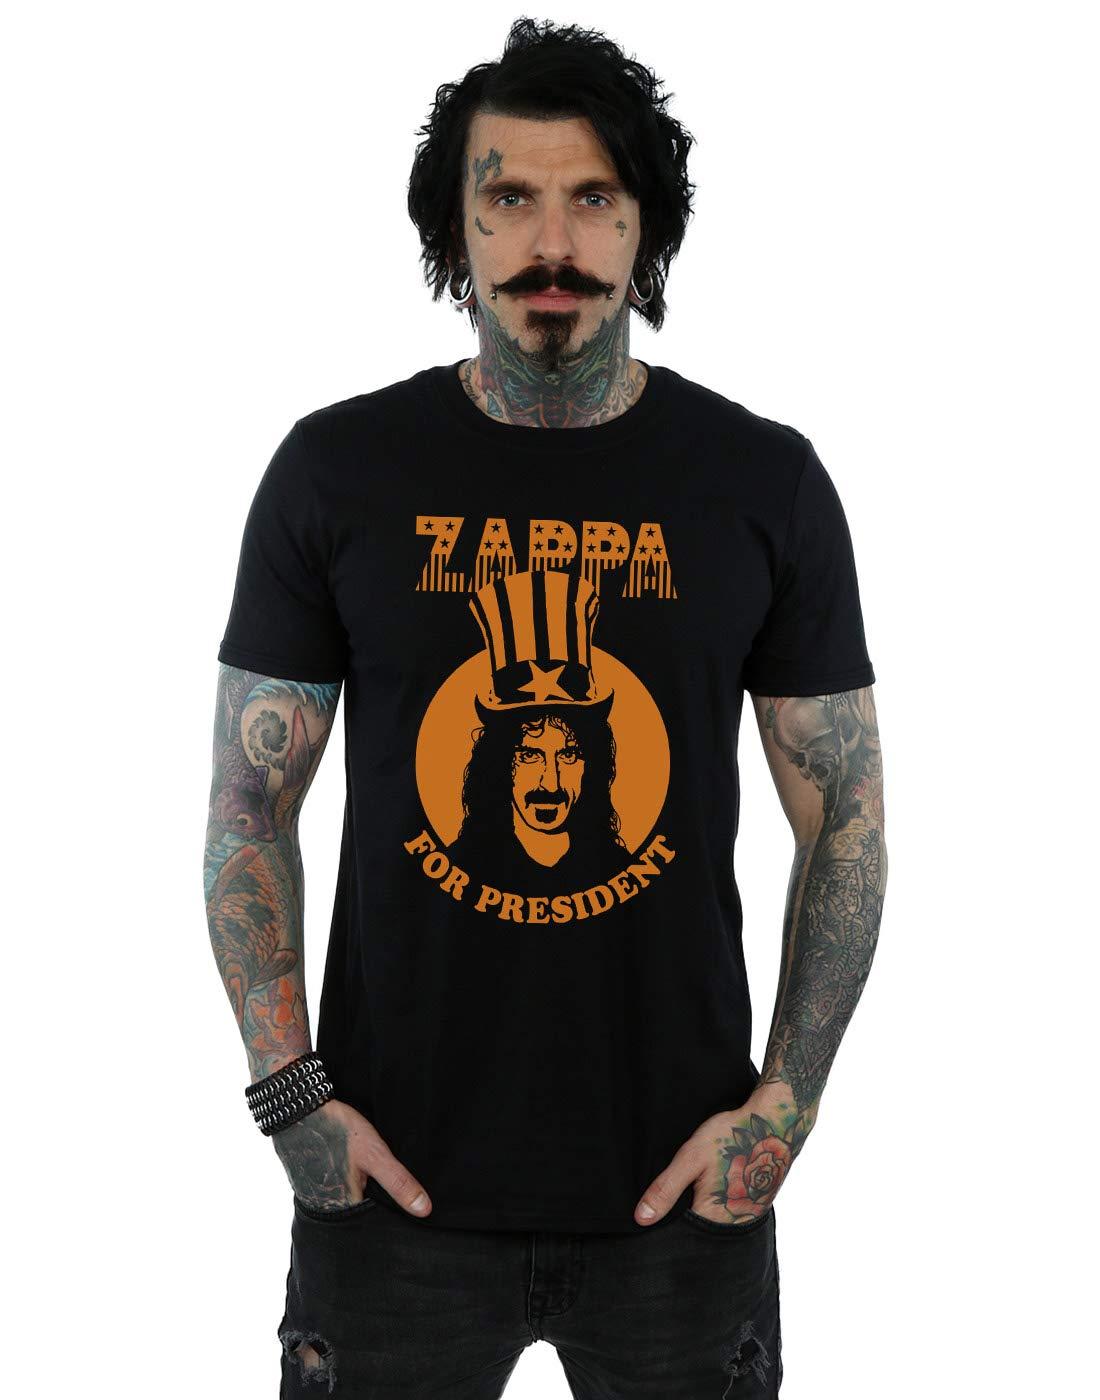 Frank Zappa S For President Tshirt